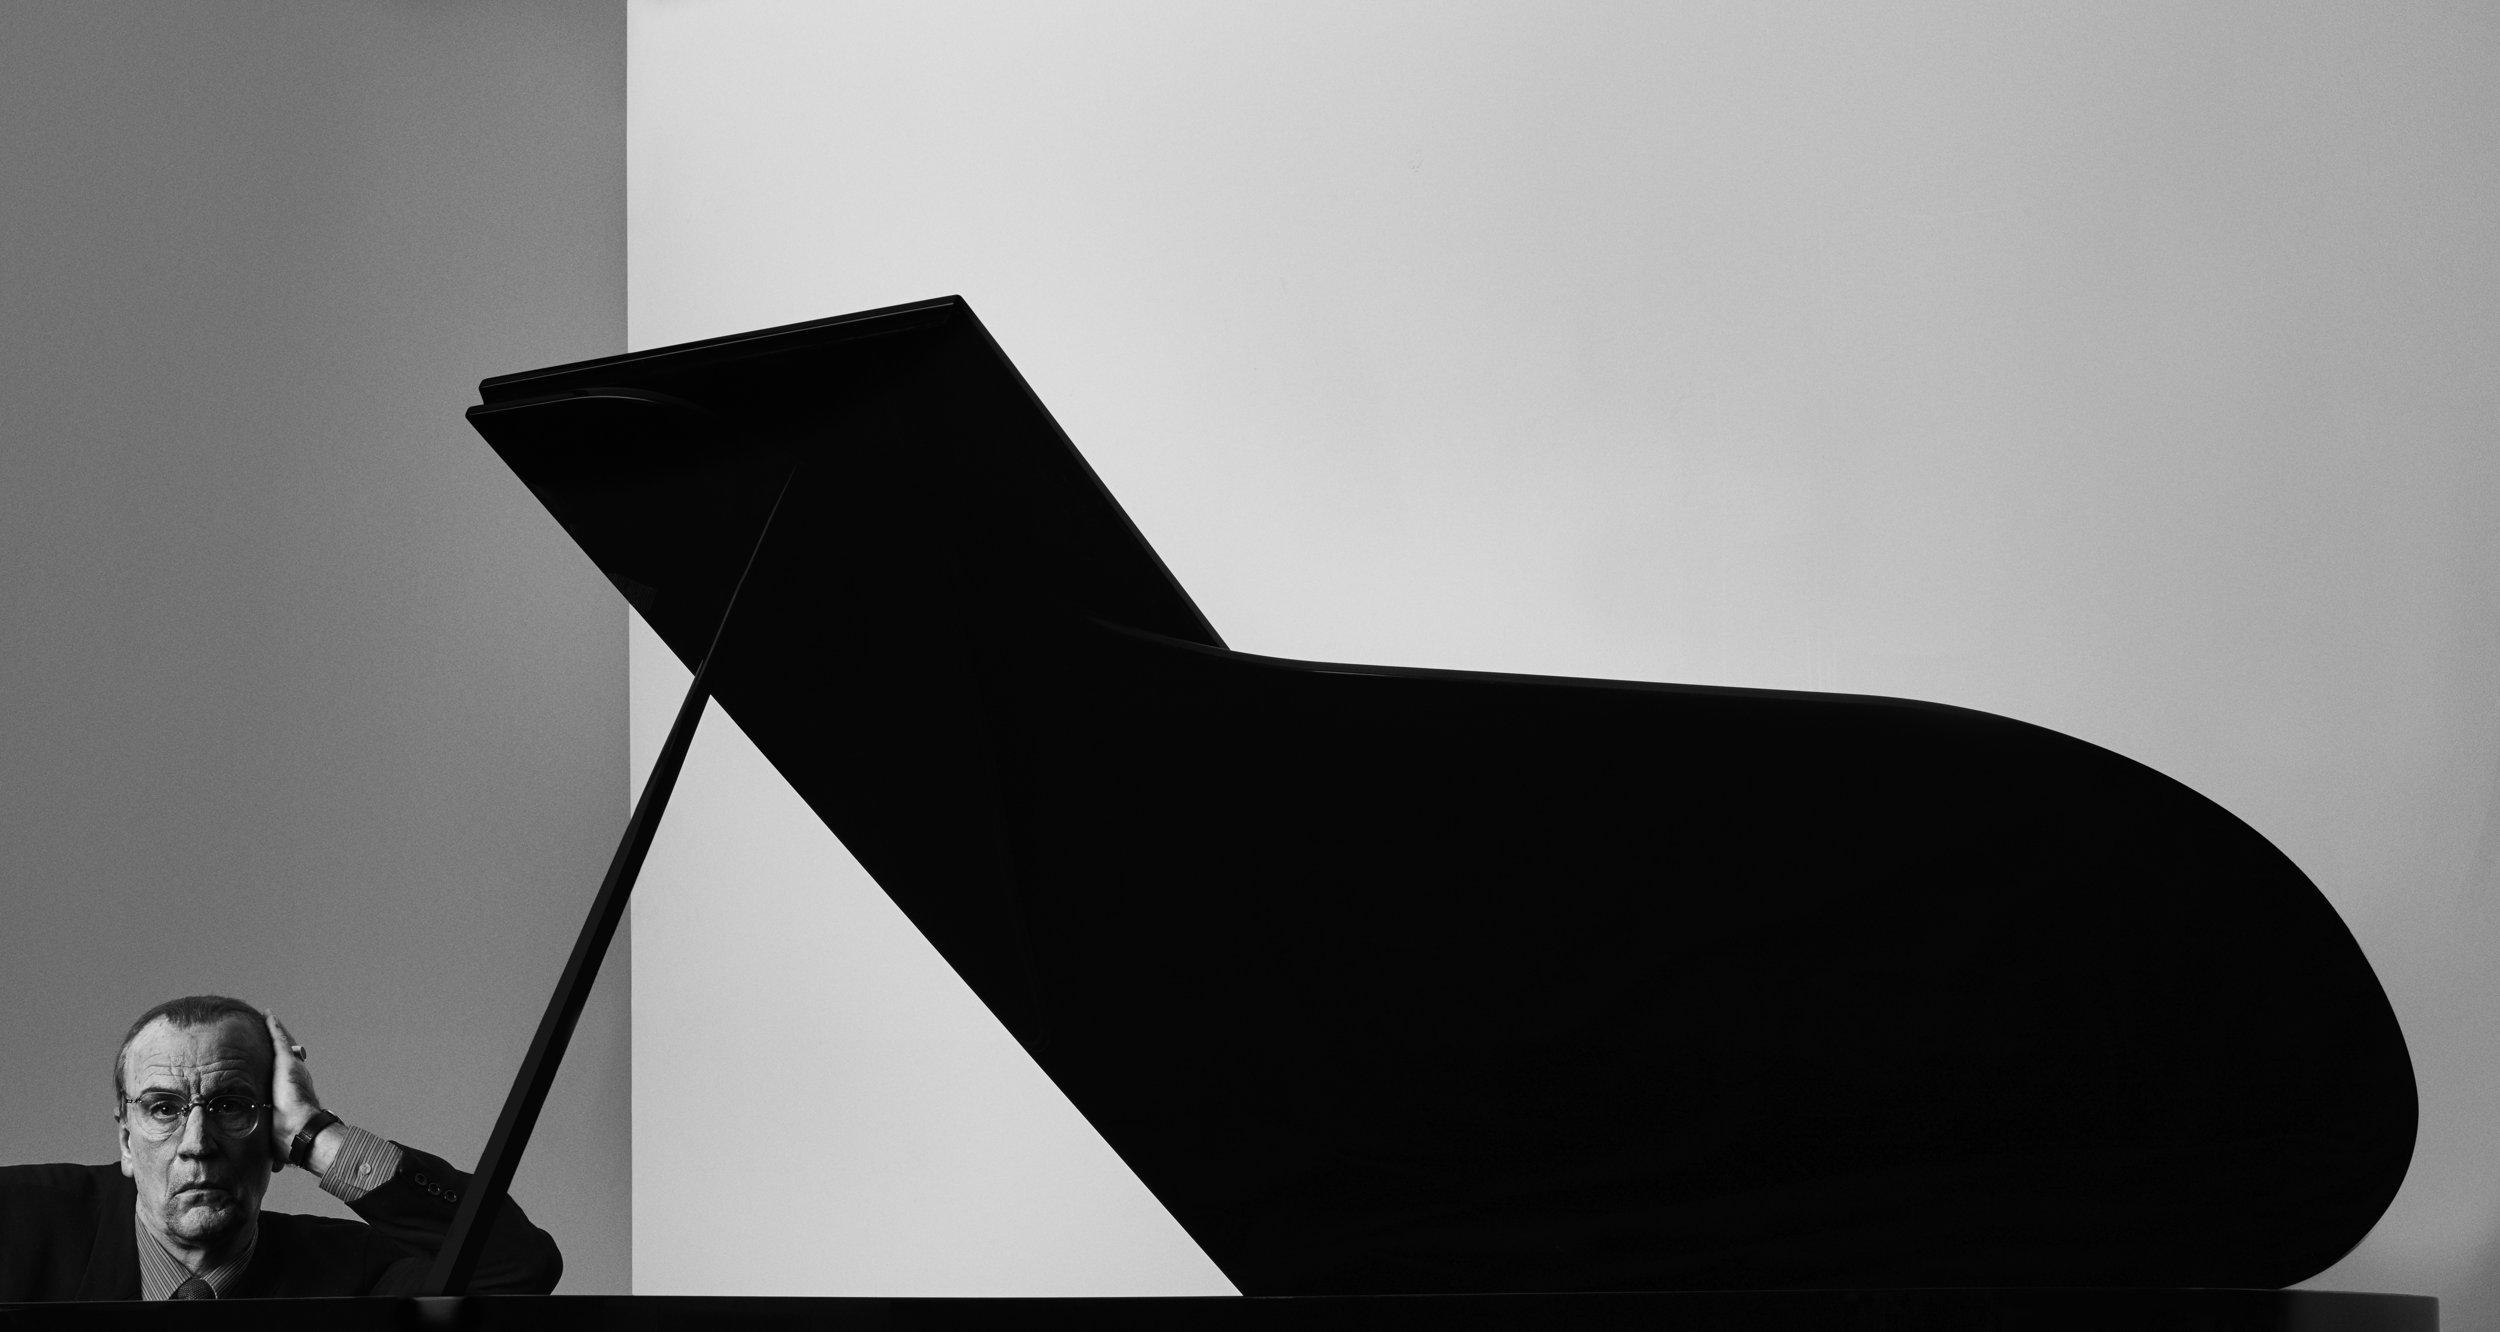 Arnold Newman / Igor Stravinsky, New York City, NY (1960), 2014